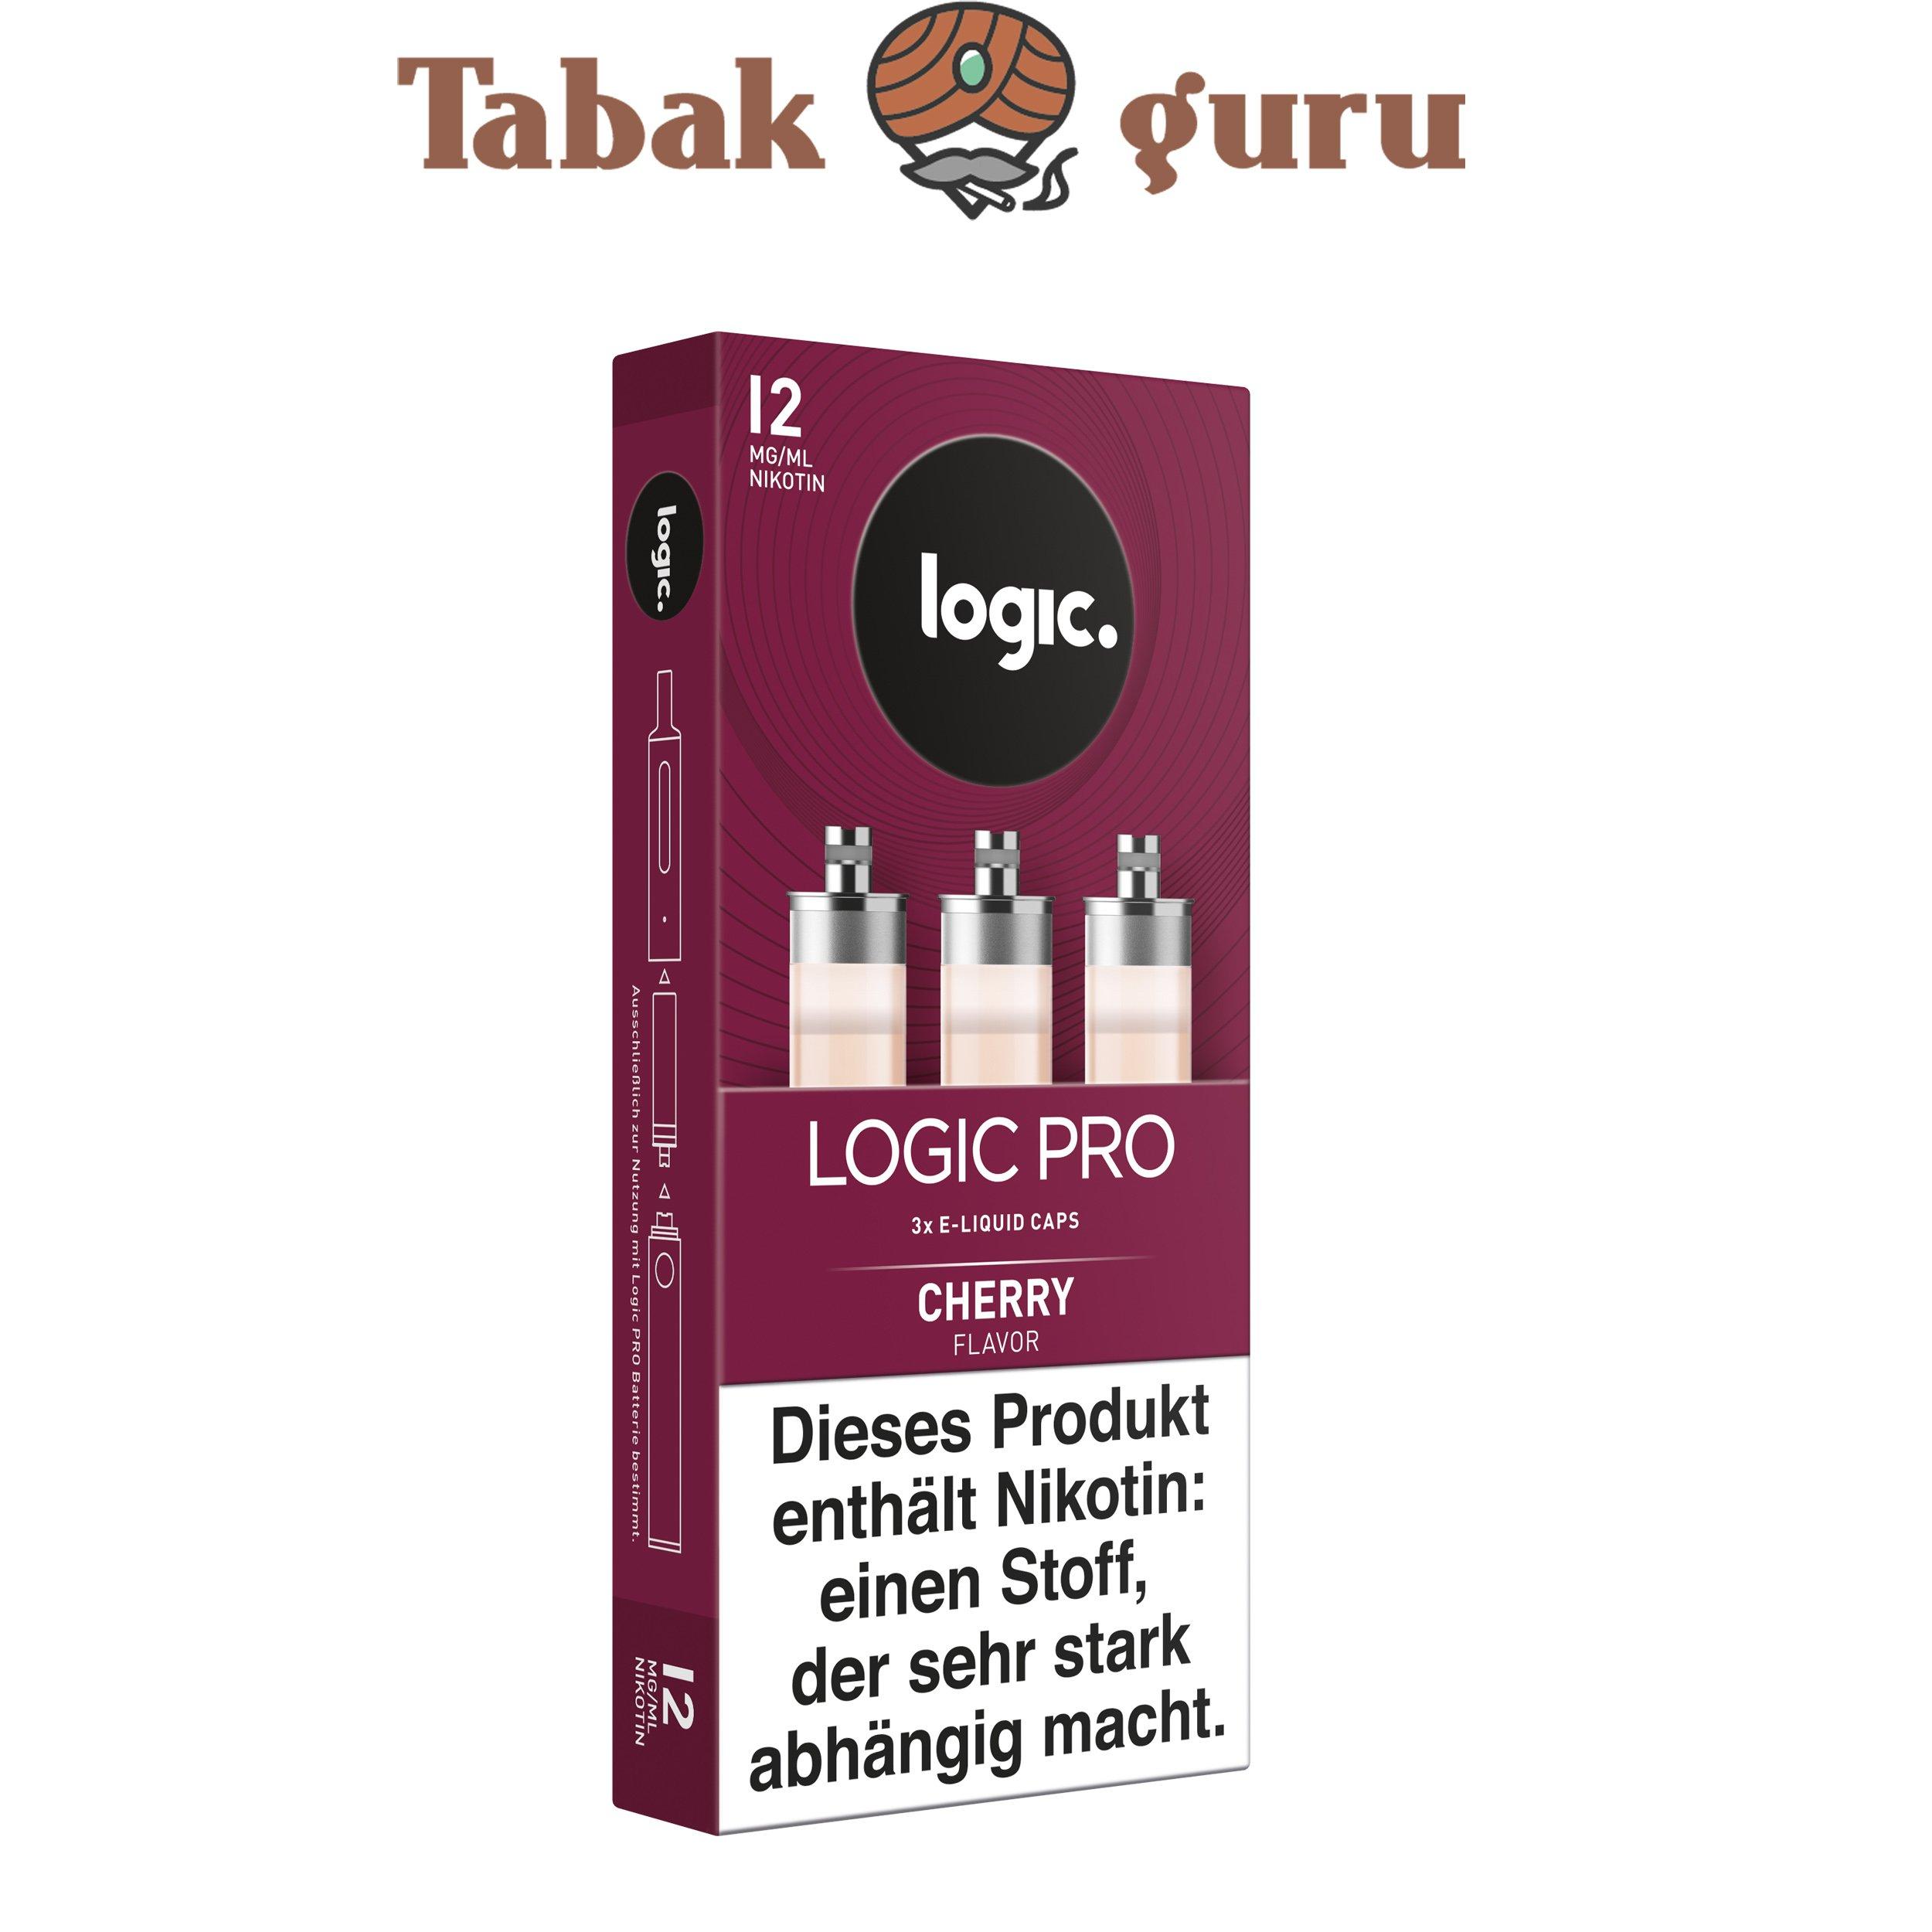 Logic Pro e-Liquid Caps Cherry Flavor 12 mg/ml Inhalt 3 Caps